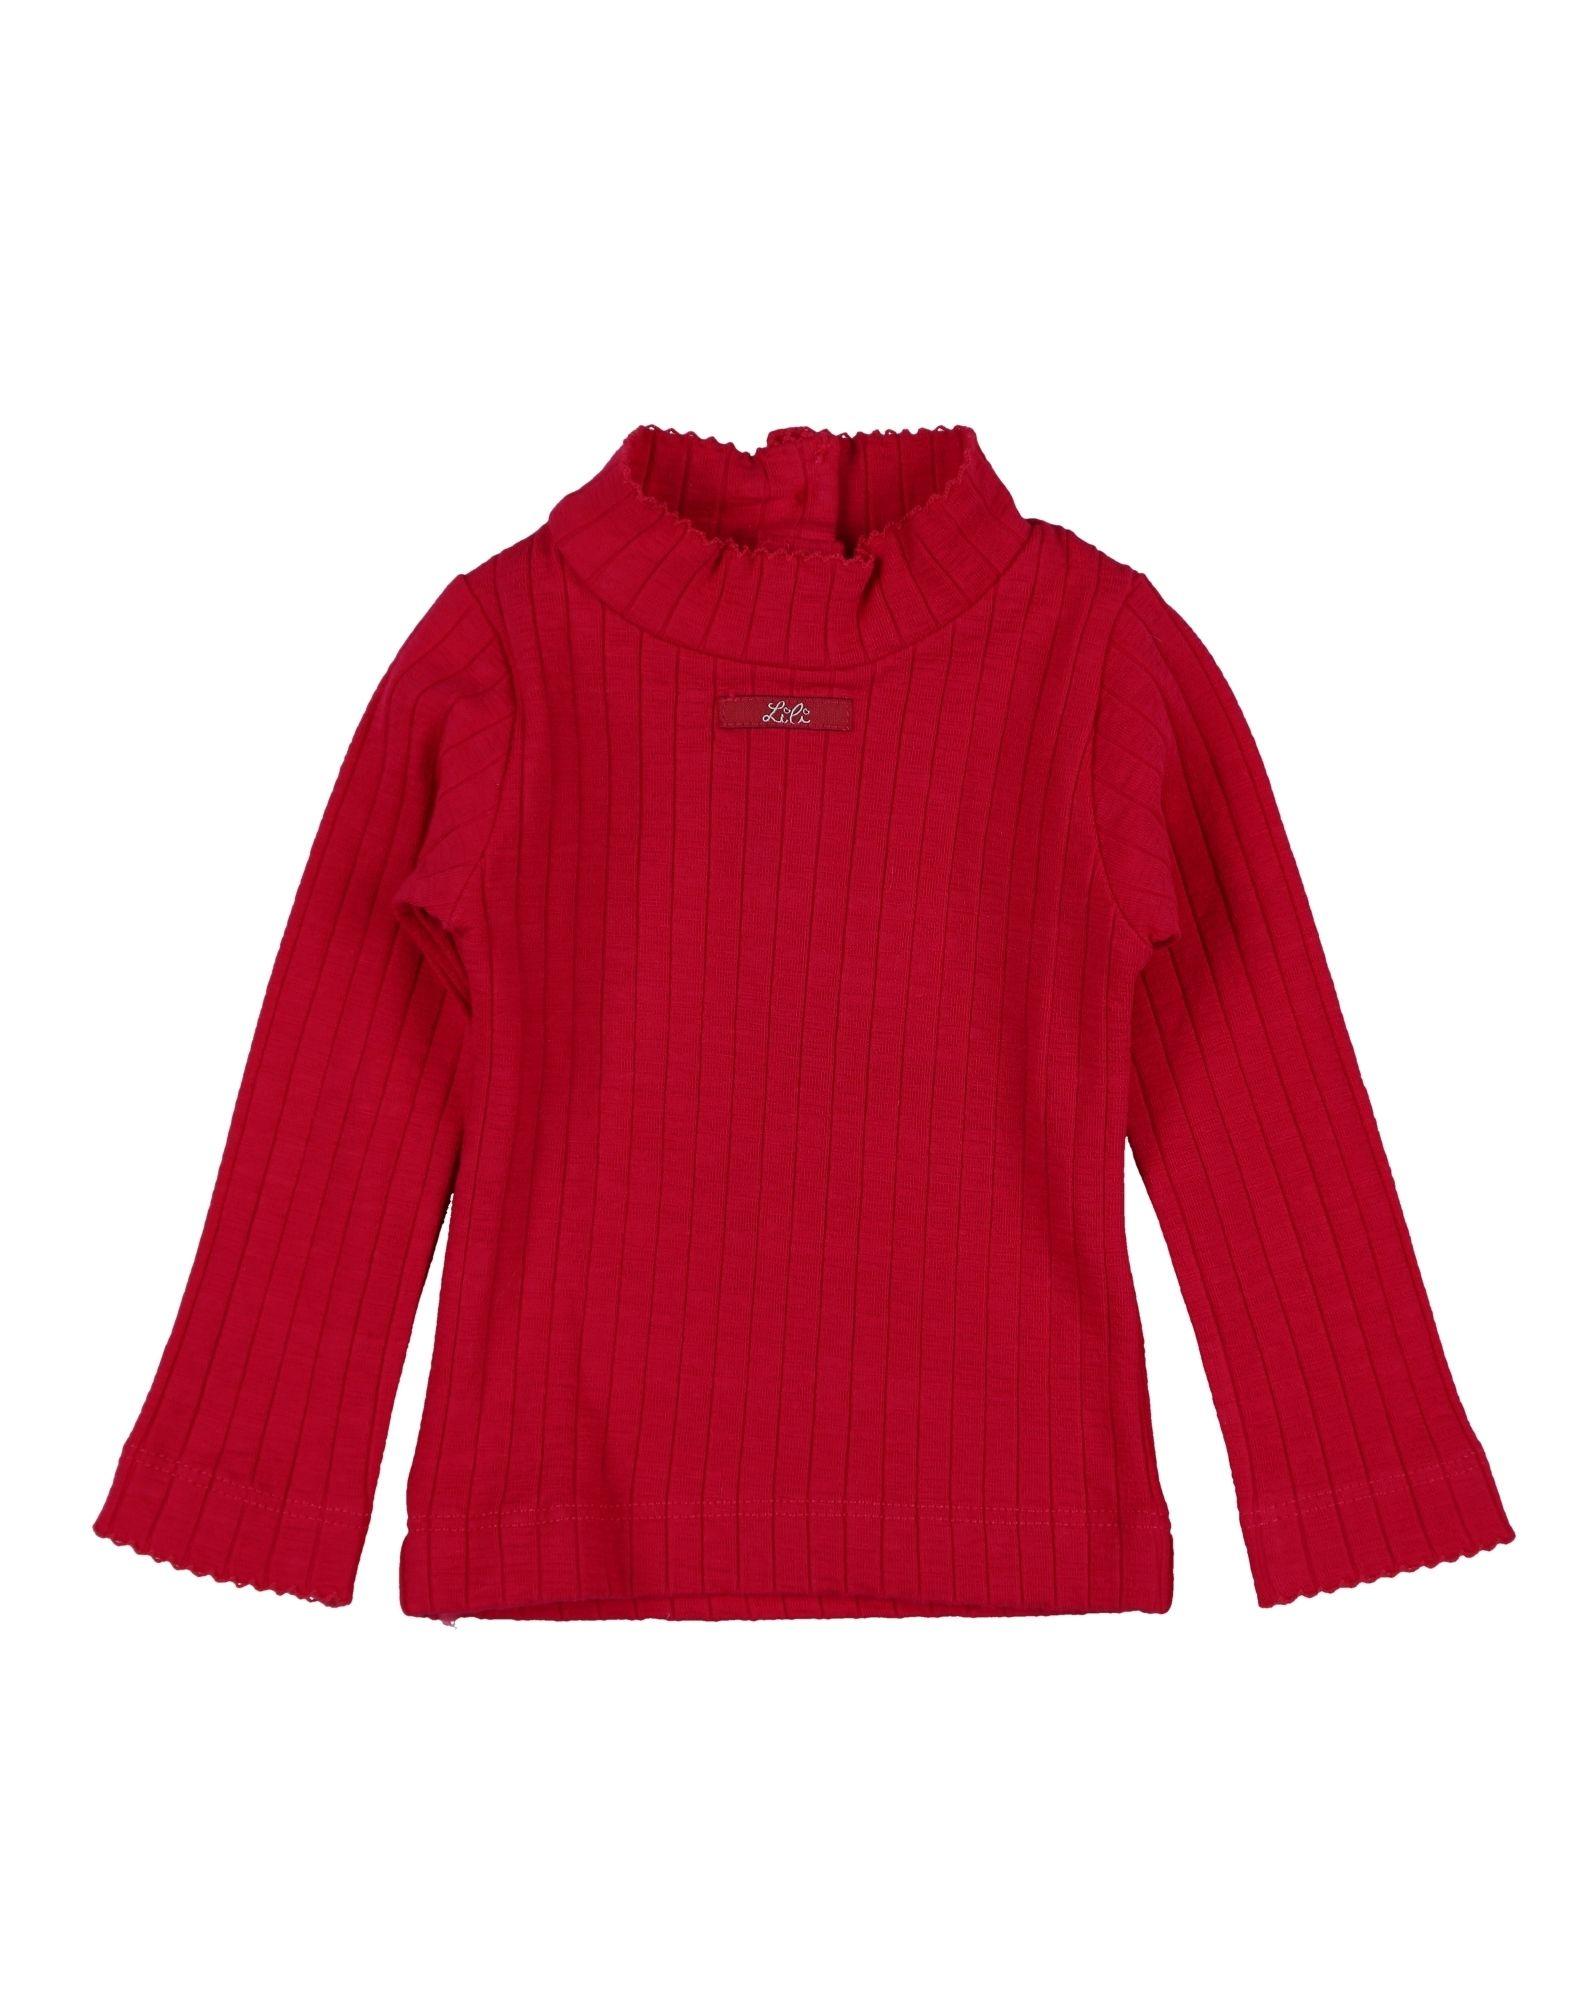 LILI GAUFRETTE Mädchen 0-24 monate T-shirts Farbe Fuchsia Größe 4